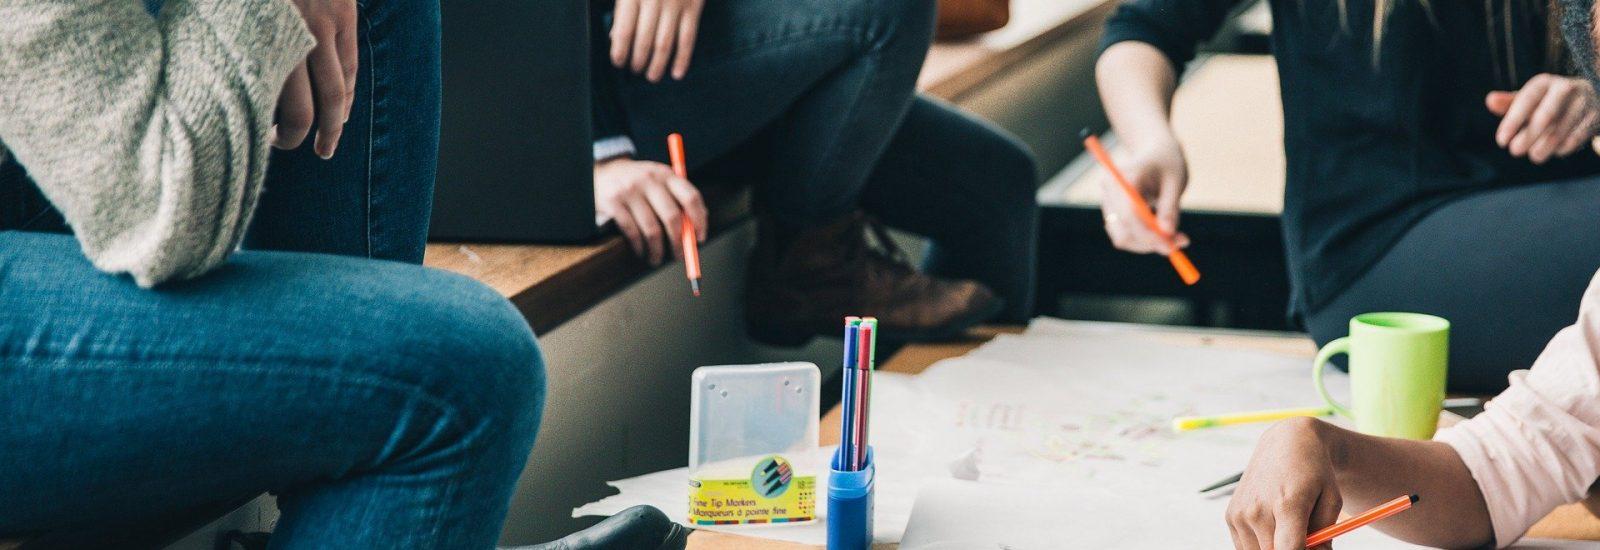 Sozialpädagogin oder Sozialpädagoge